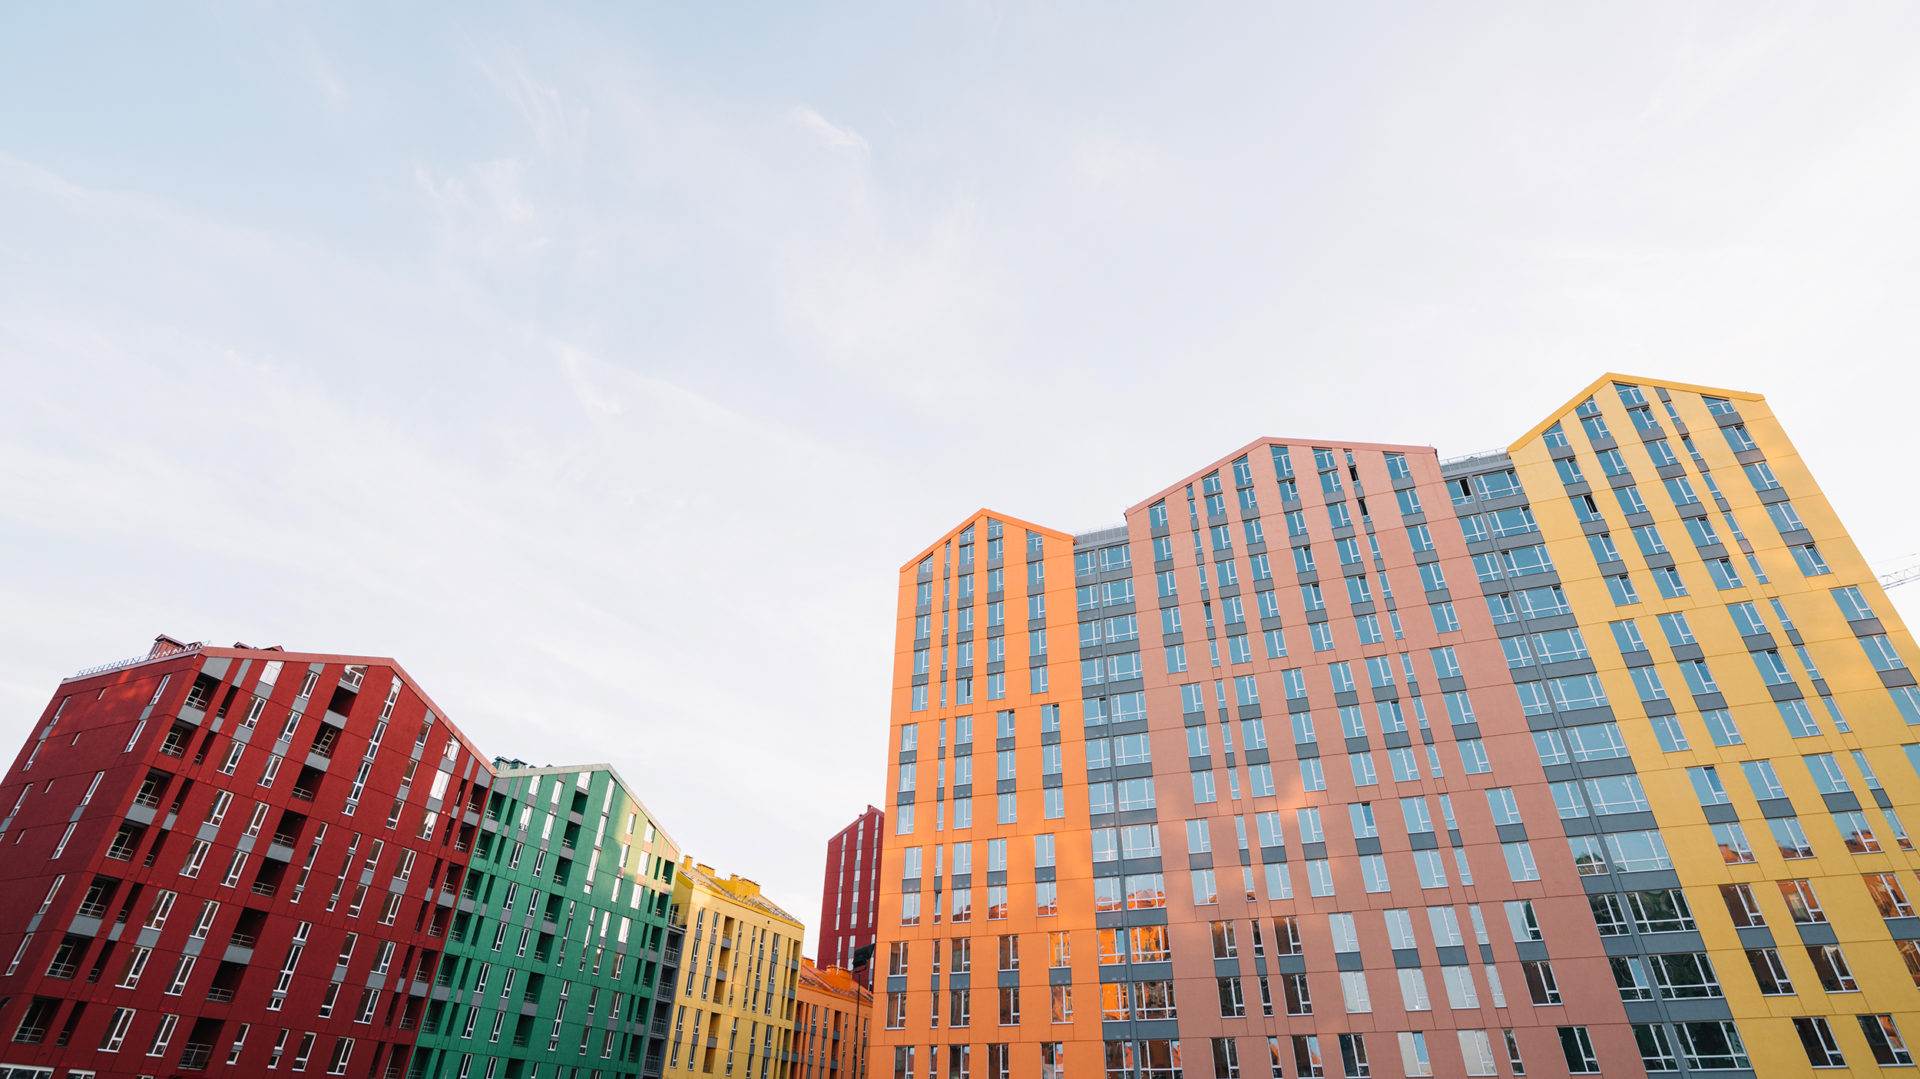 Immobilienverwaltung Vehring